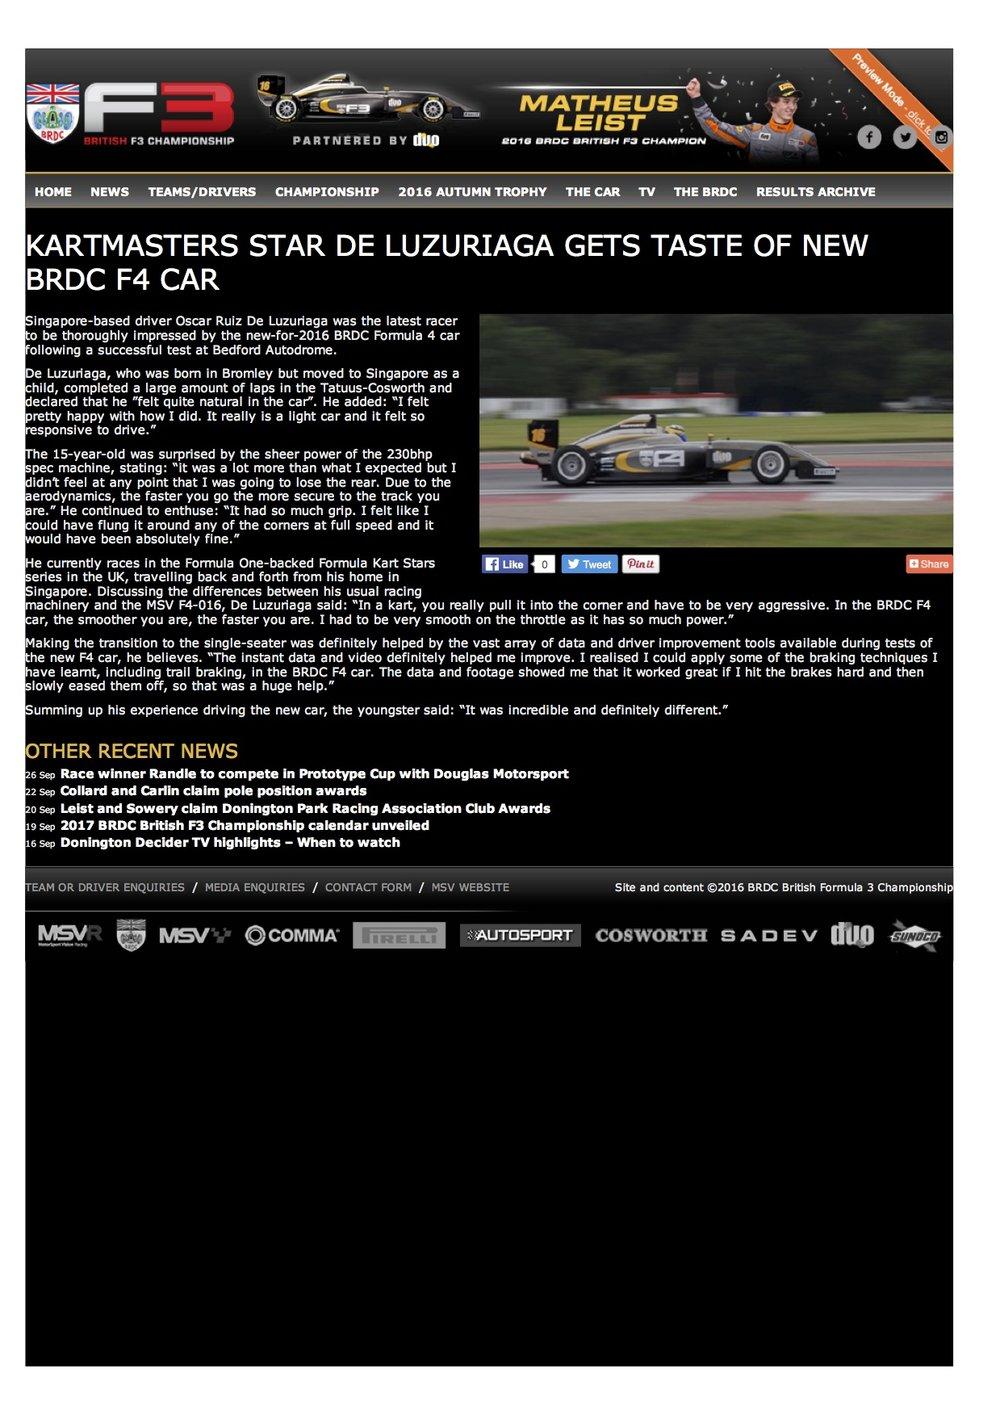 Kartmasters star De Luzuriaga gets taste of new BRDC F4 car.jpg